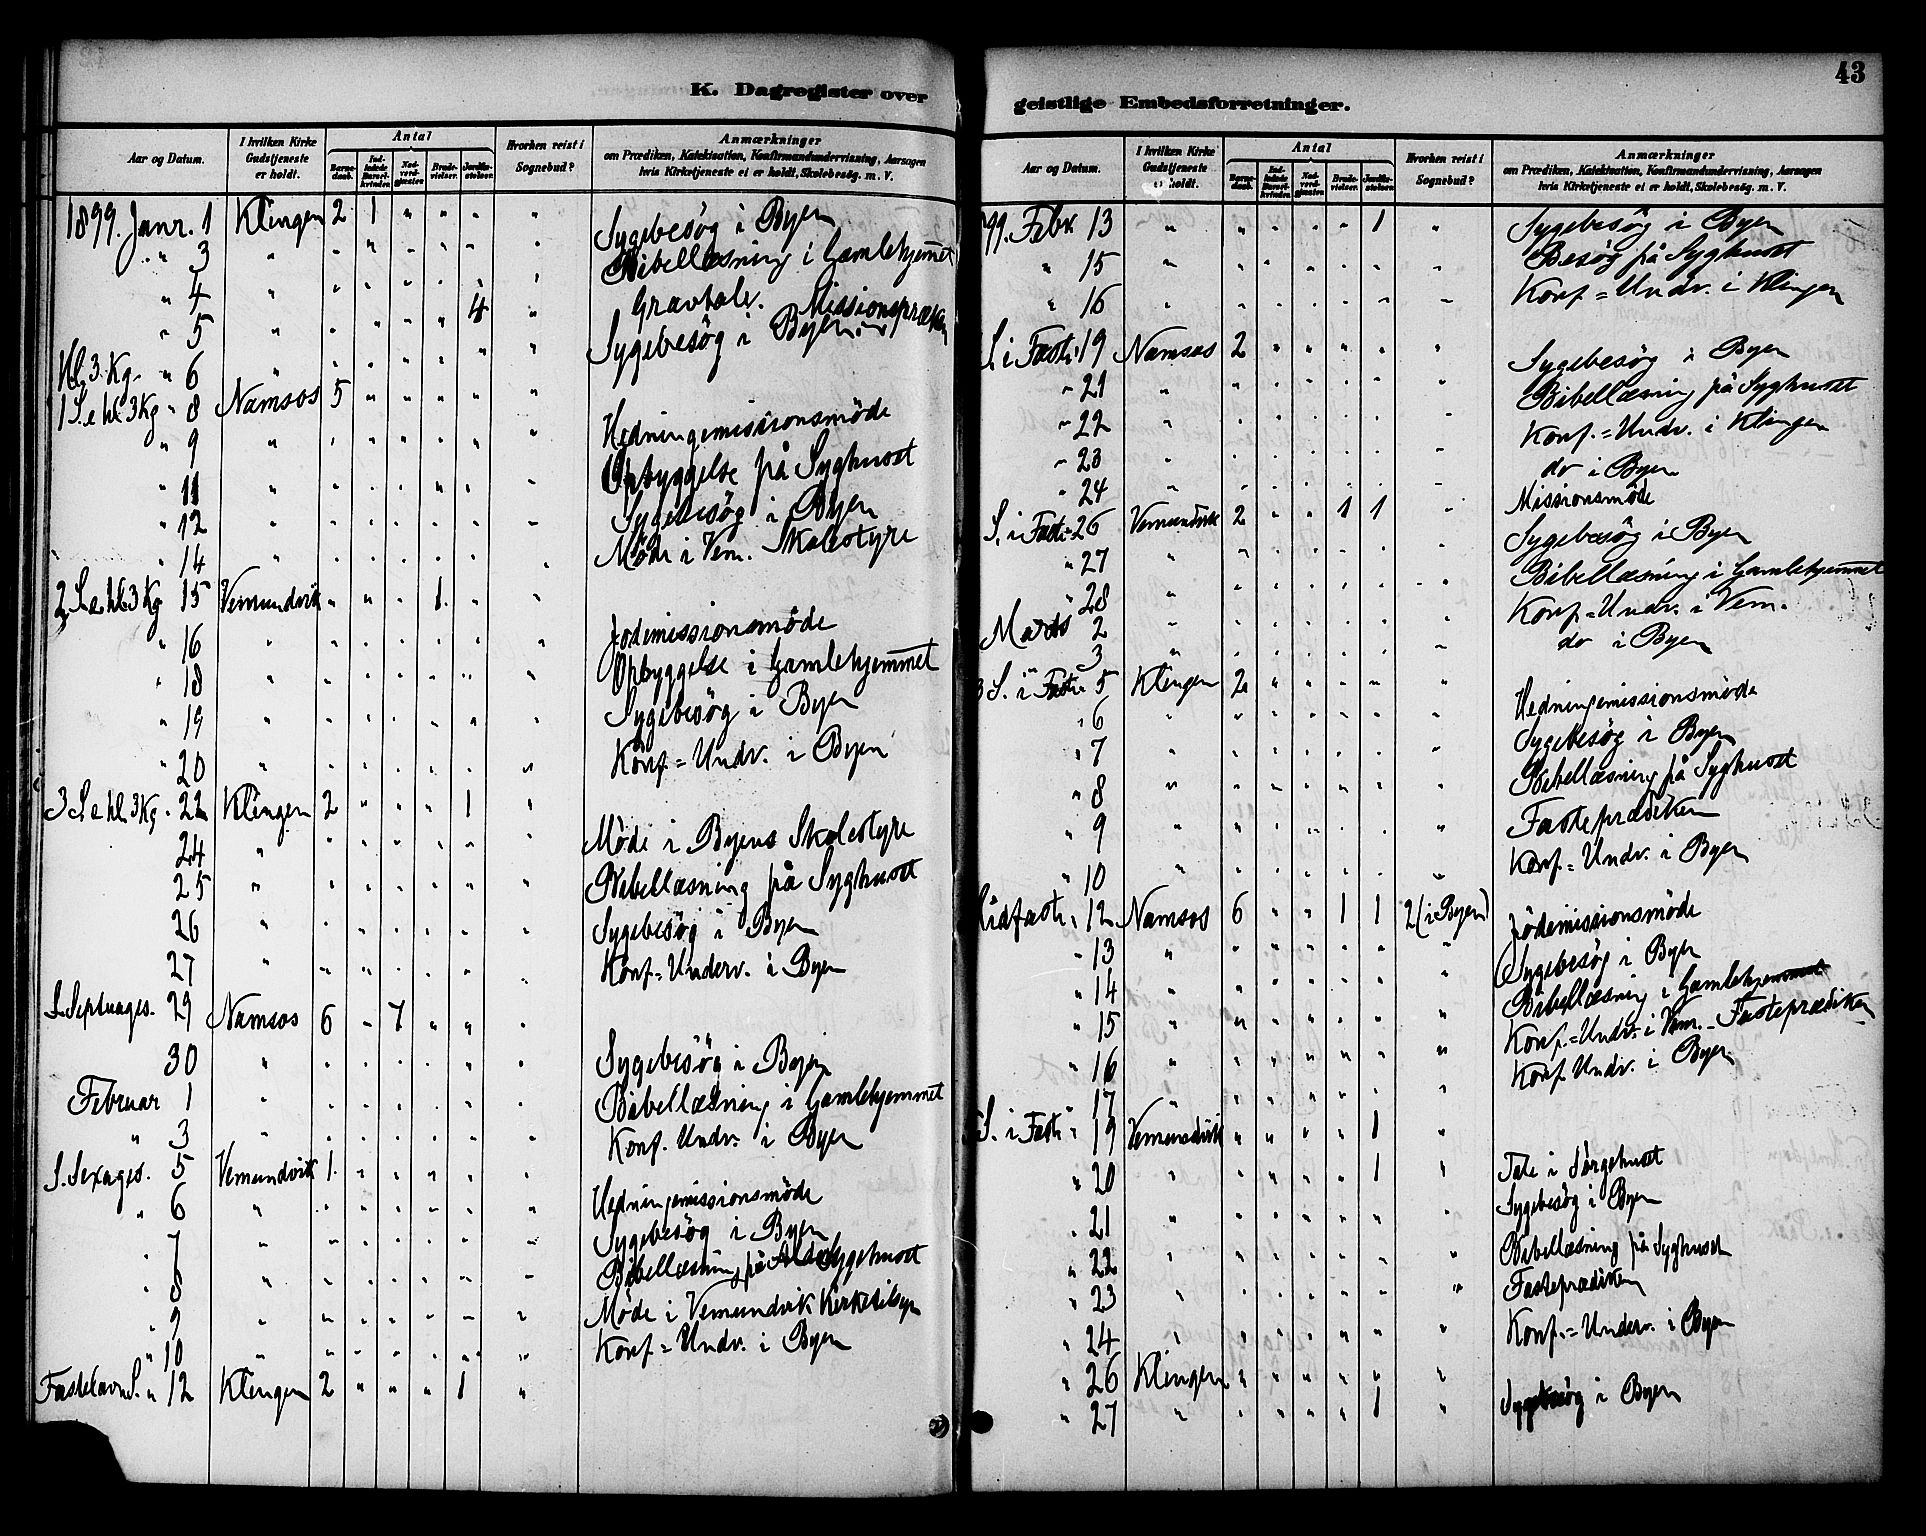 SAT, Ministerialprotokoller, klokkerbøker og fødselsregistre - Nord-Trøndelag, 768/L0575: Dagregister nr. 766A09, 1889-1931, s. 43